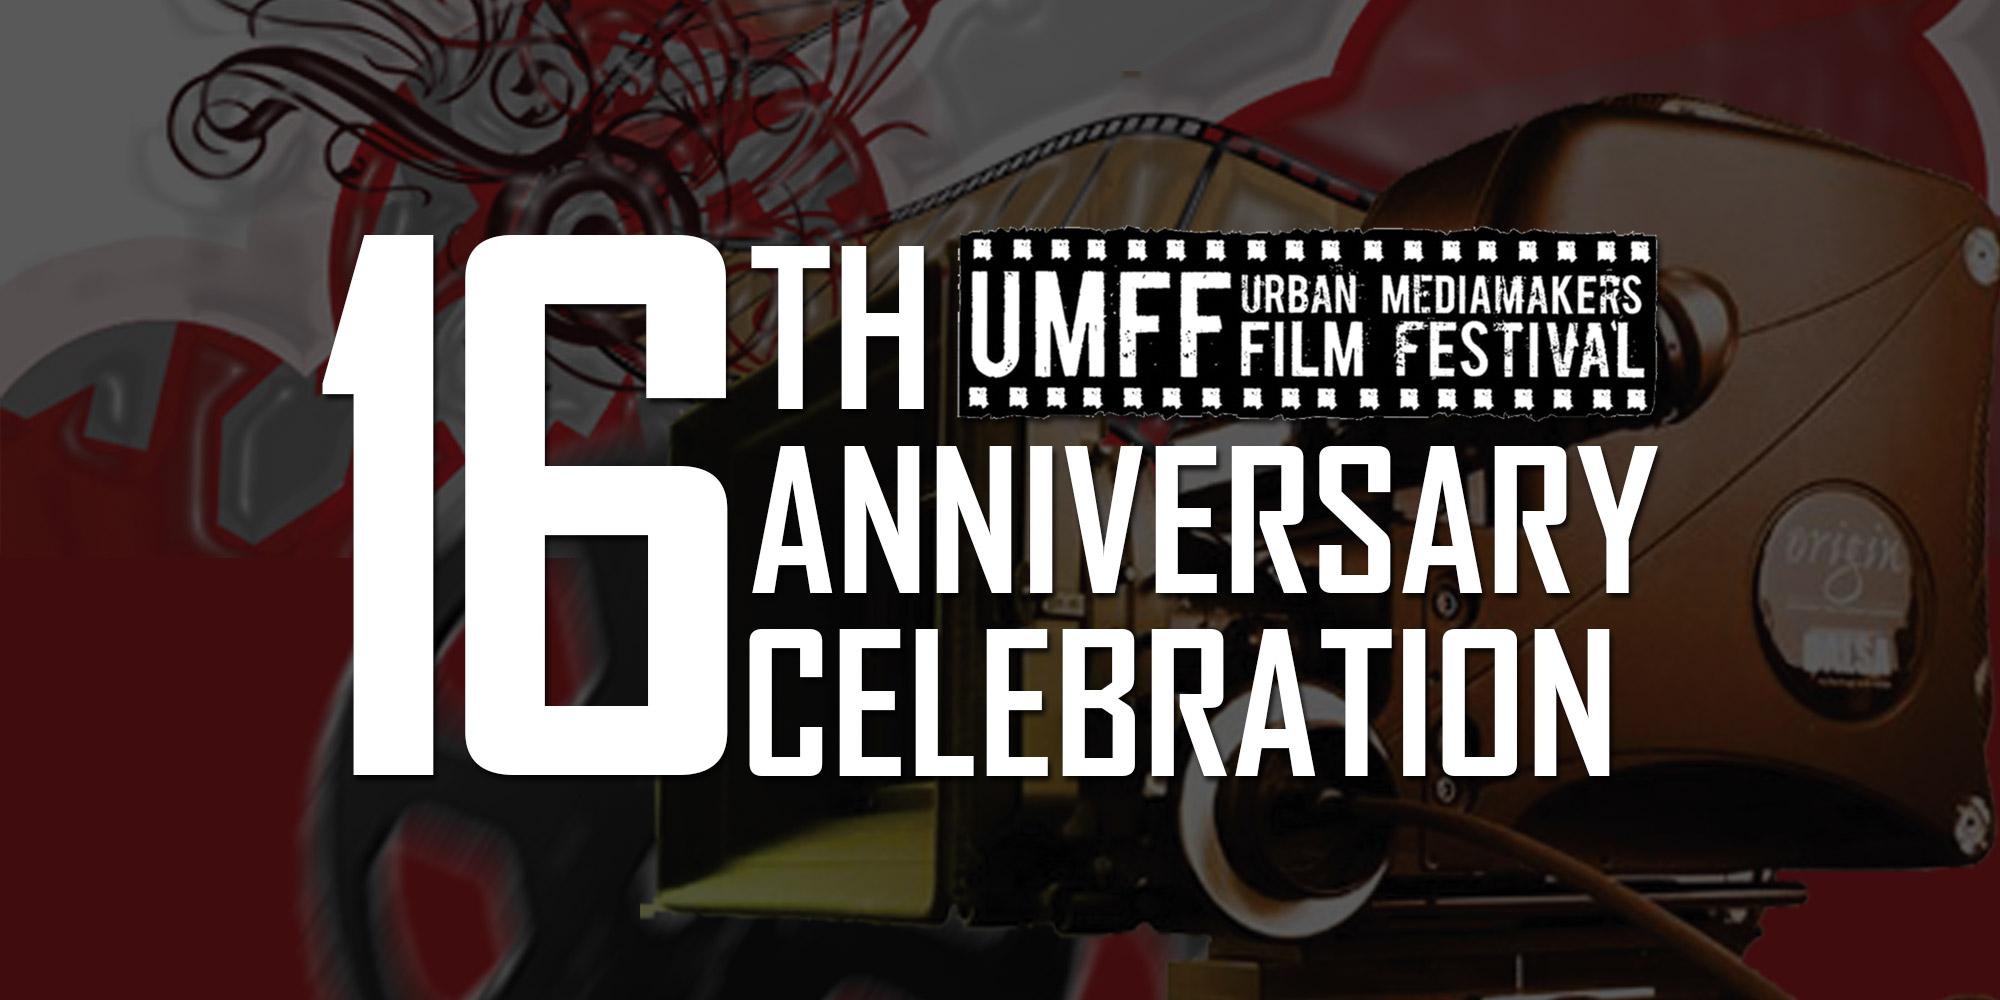 Urban Mediamakers 16th Anniversary